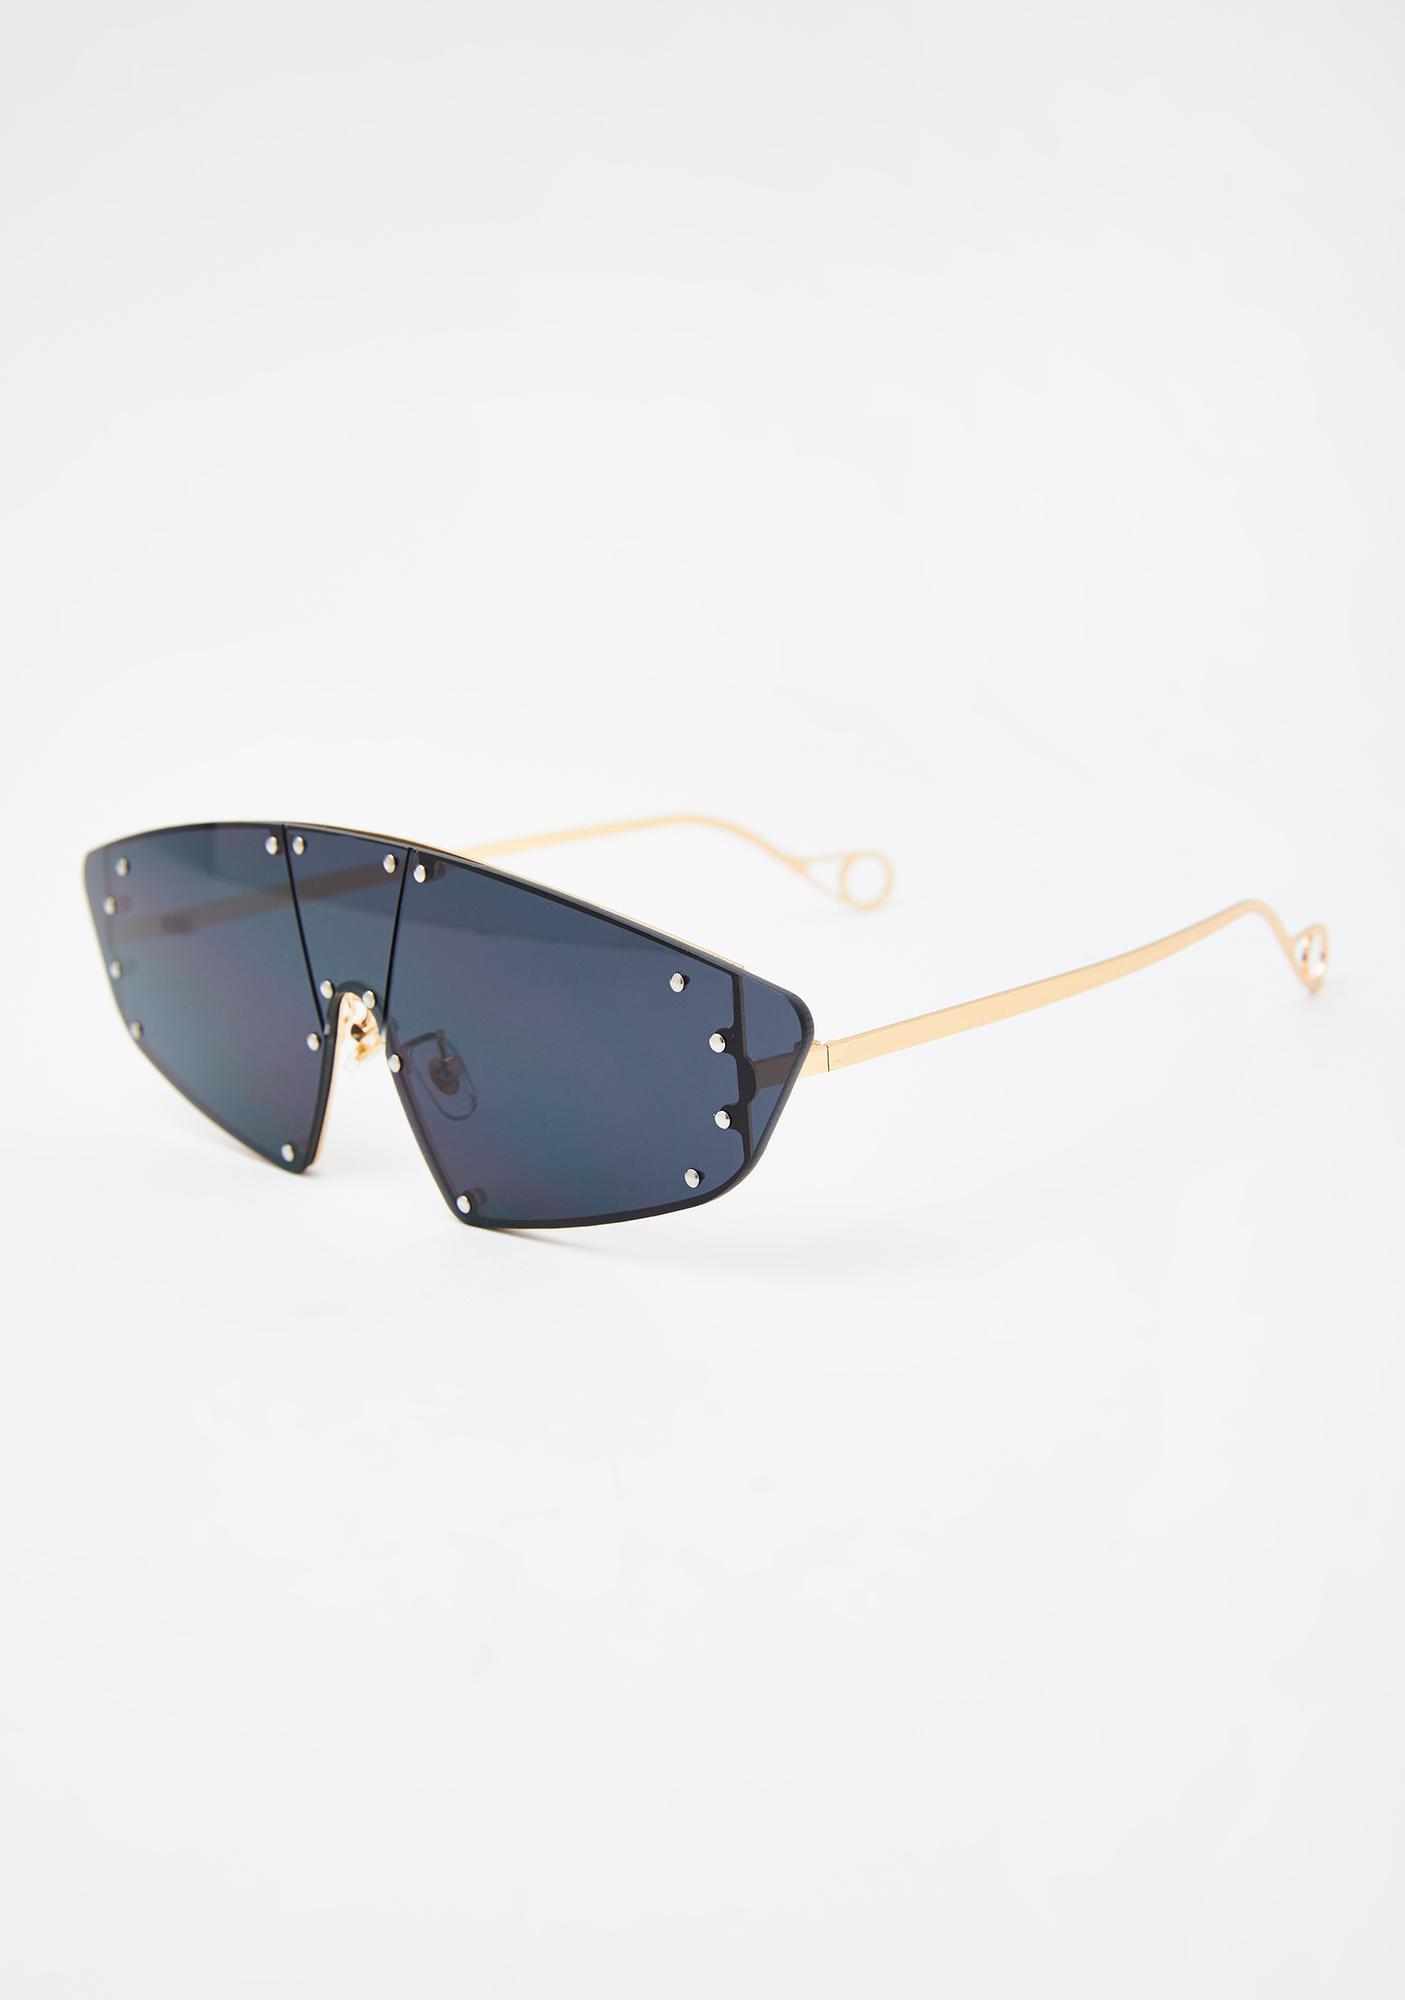 Wicked Hard To Catch Aviator Sunglasses